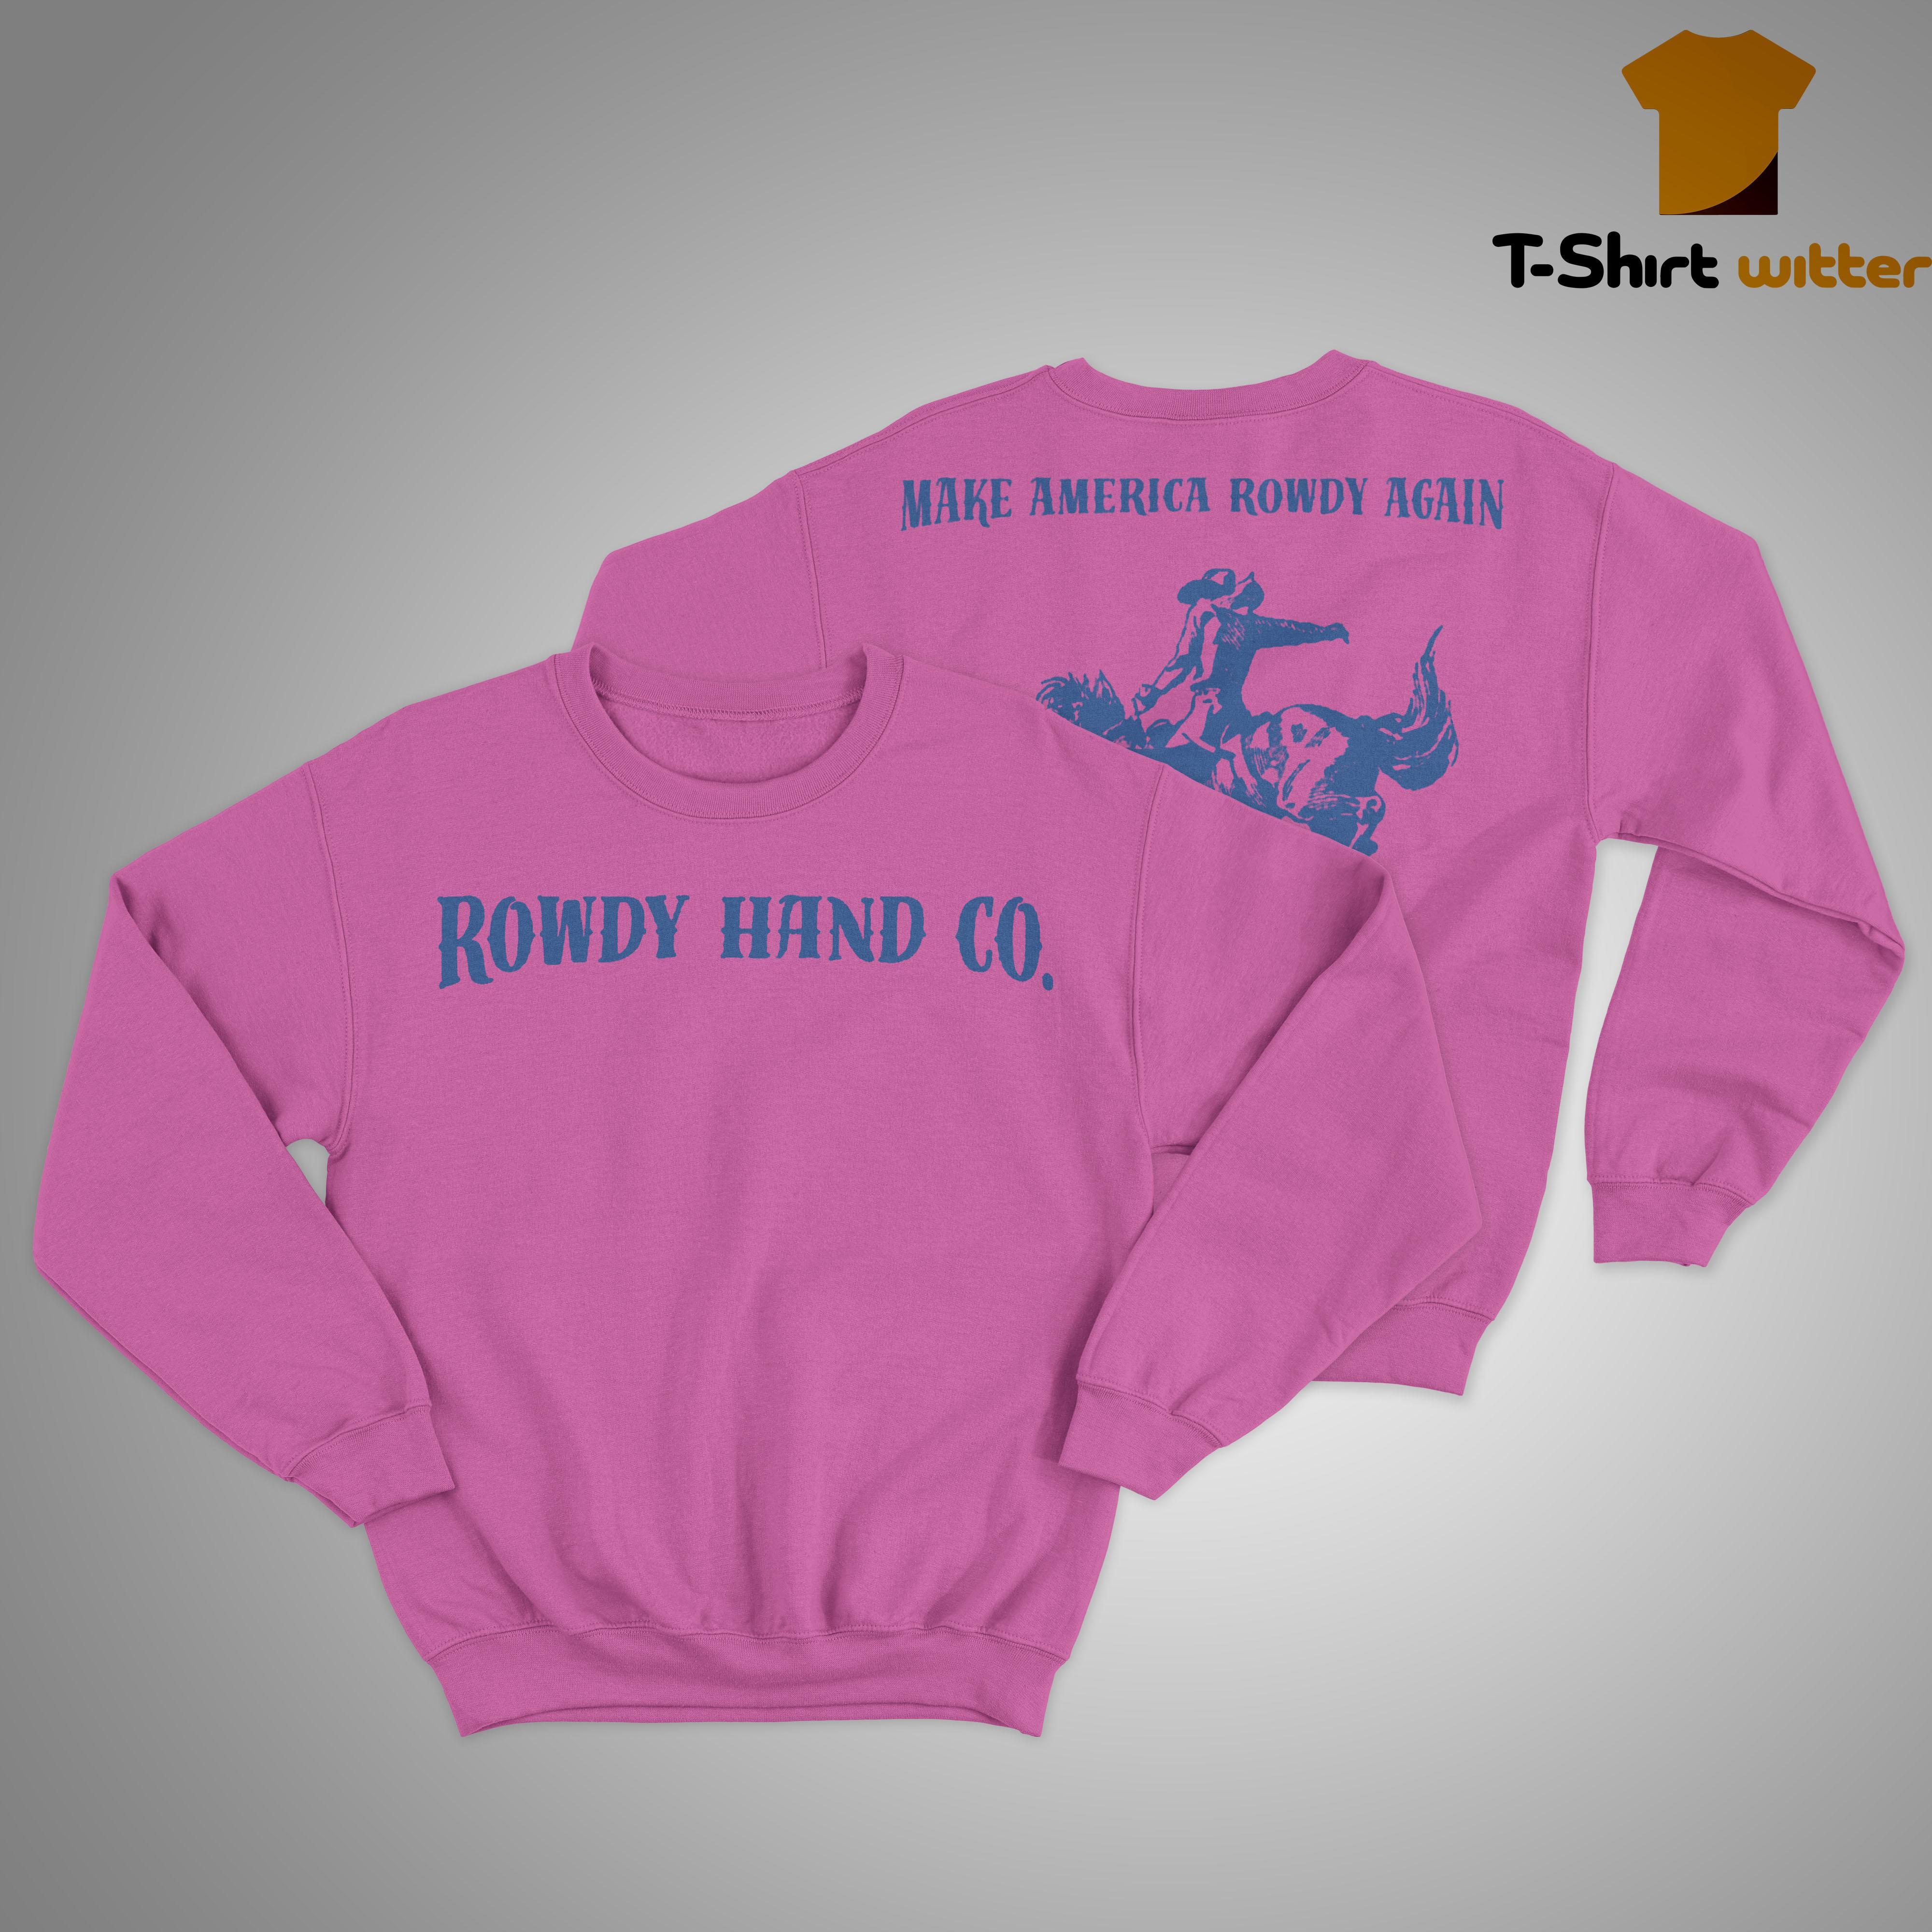 Rowdy Hand Co Make America Rowdy Again Sweater